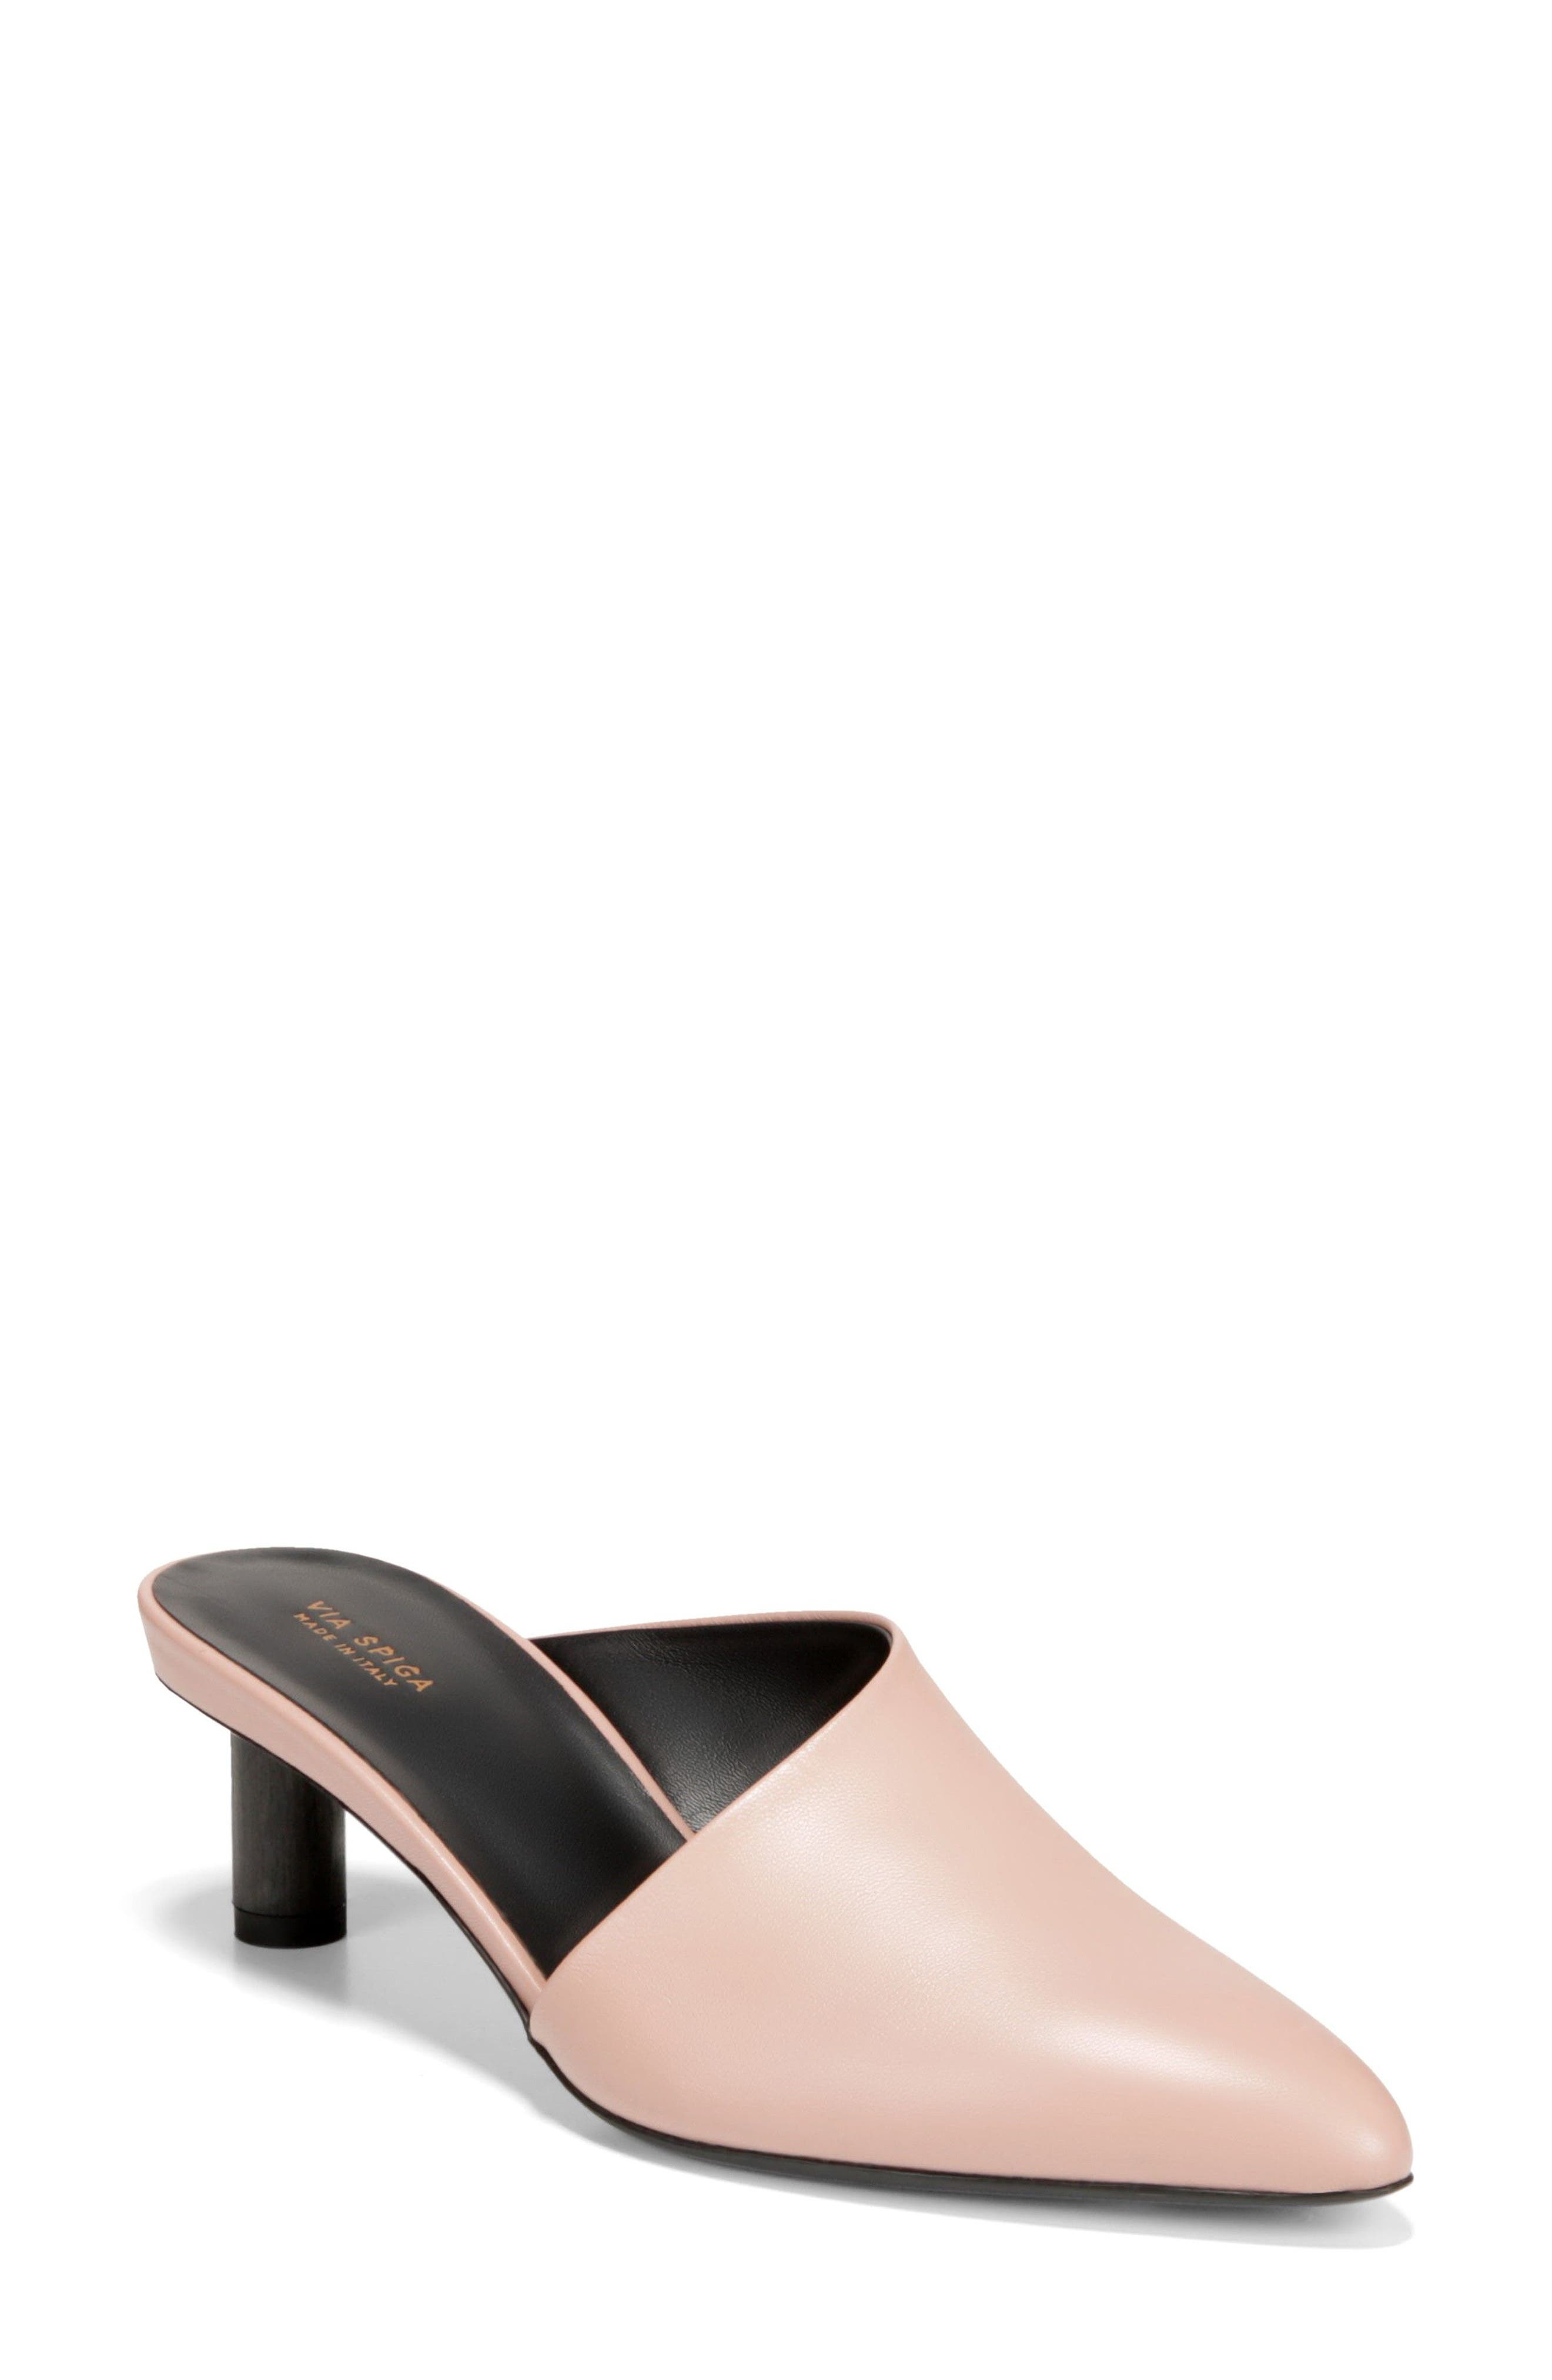 Freya Asymmetrical Mule,                         Main,                         color, Sand Leather